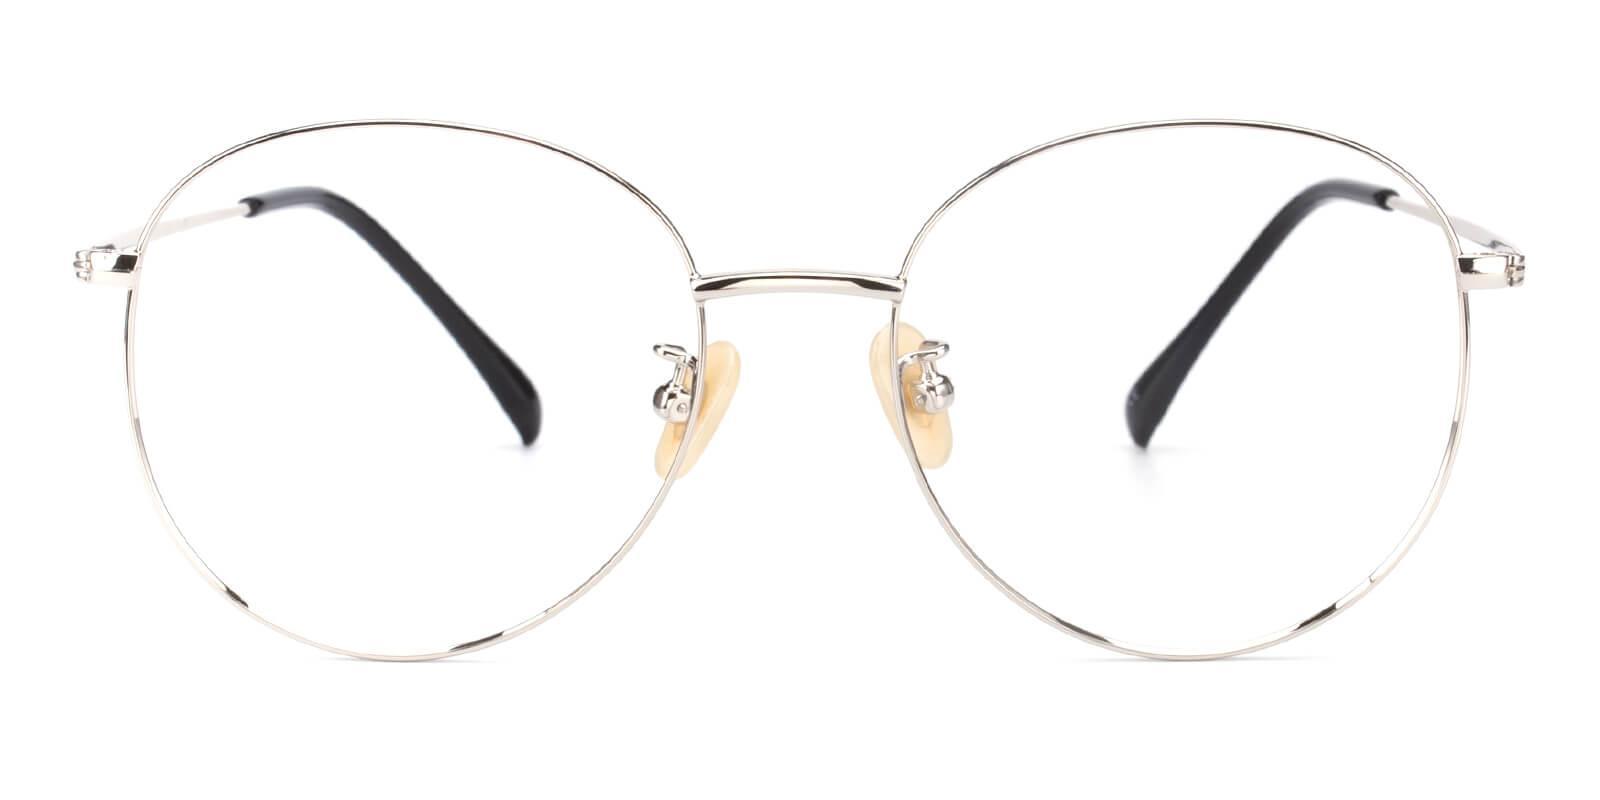 Epilogue-Silver-Round-Titanium-Eyeglasses-additional2